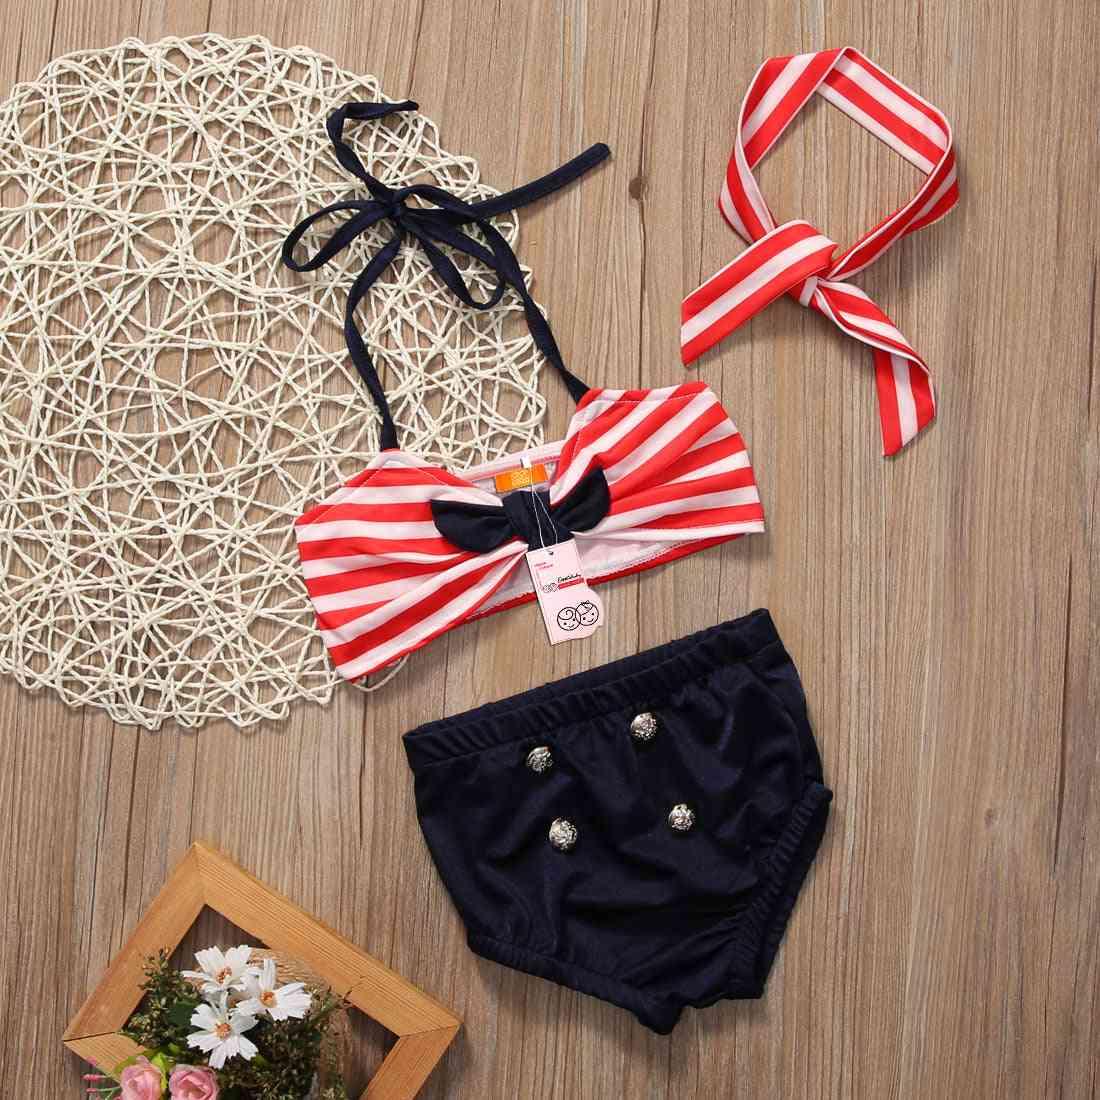 Baby Bikini 2 Piece Set - Kids Striped Swimwear Bathing Suit